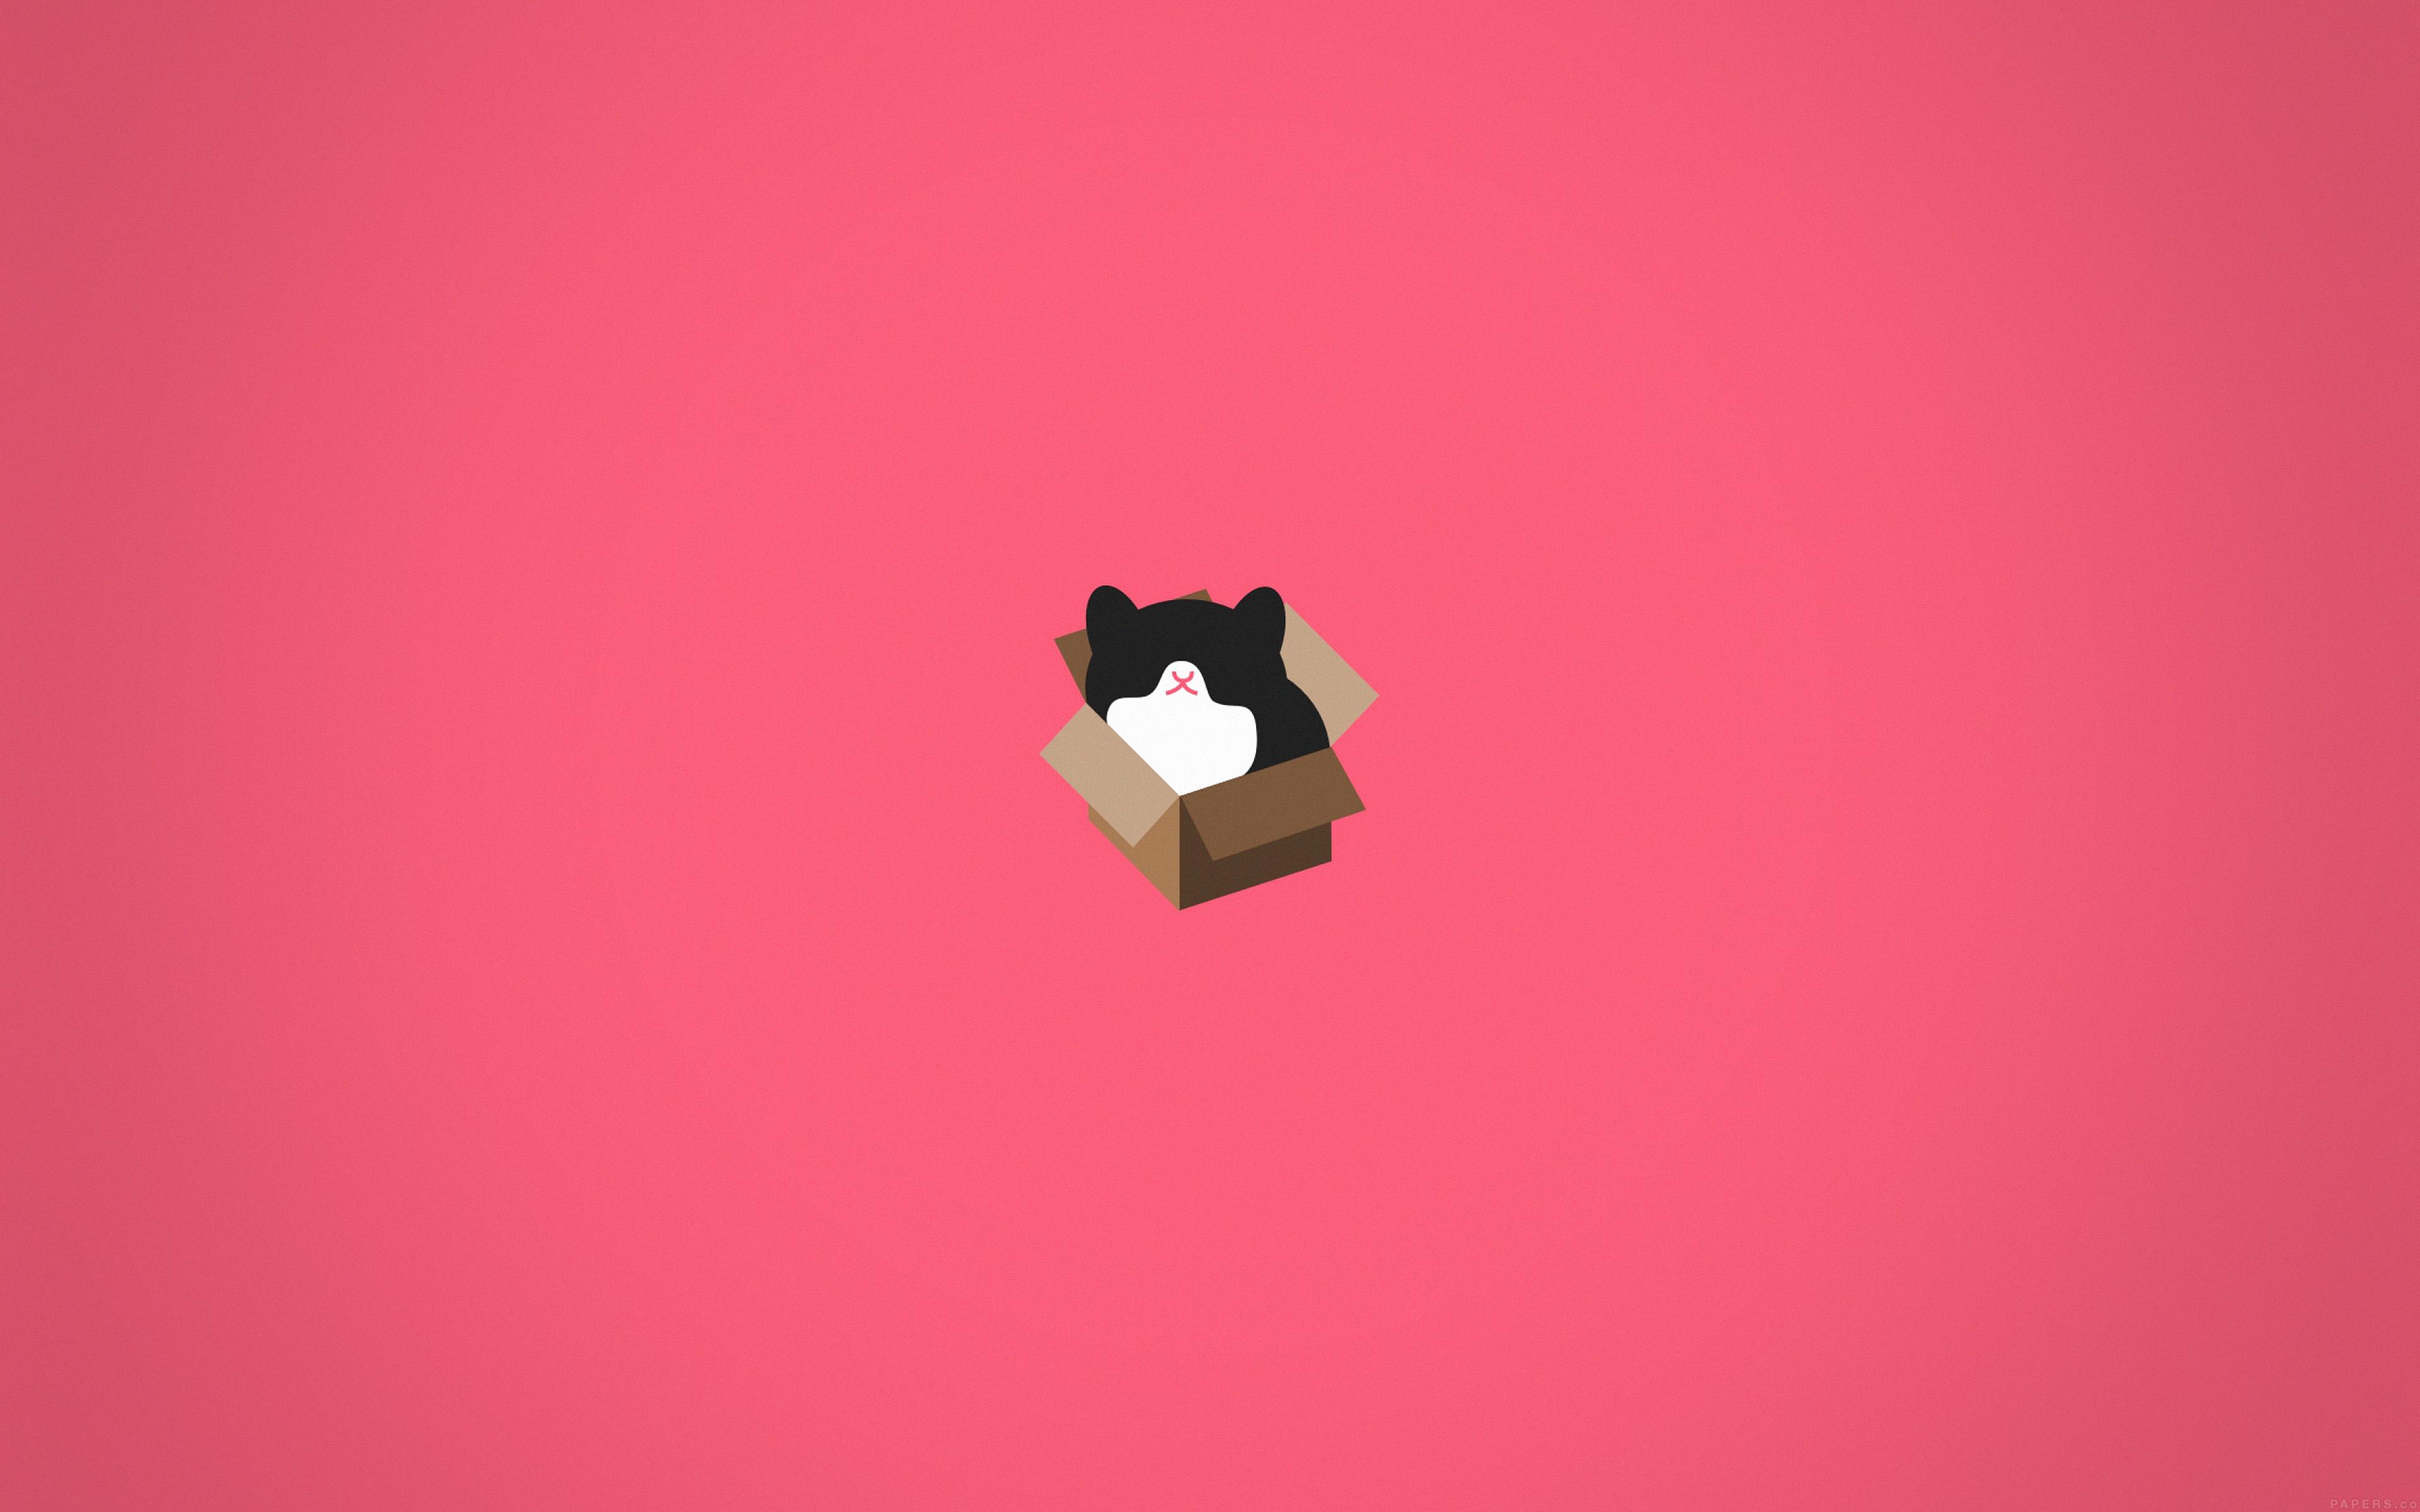 Good Wallpaper Macbook Cat - papers  Graphic_857926.jpg